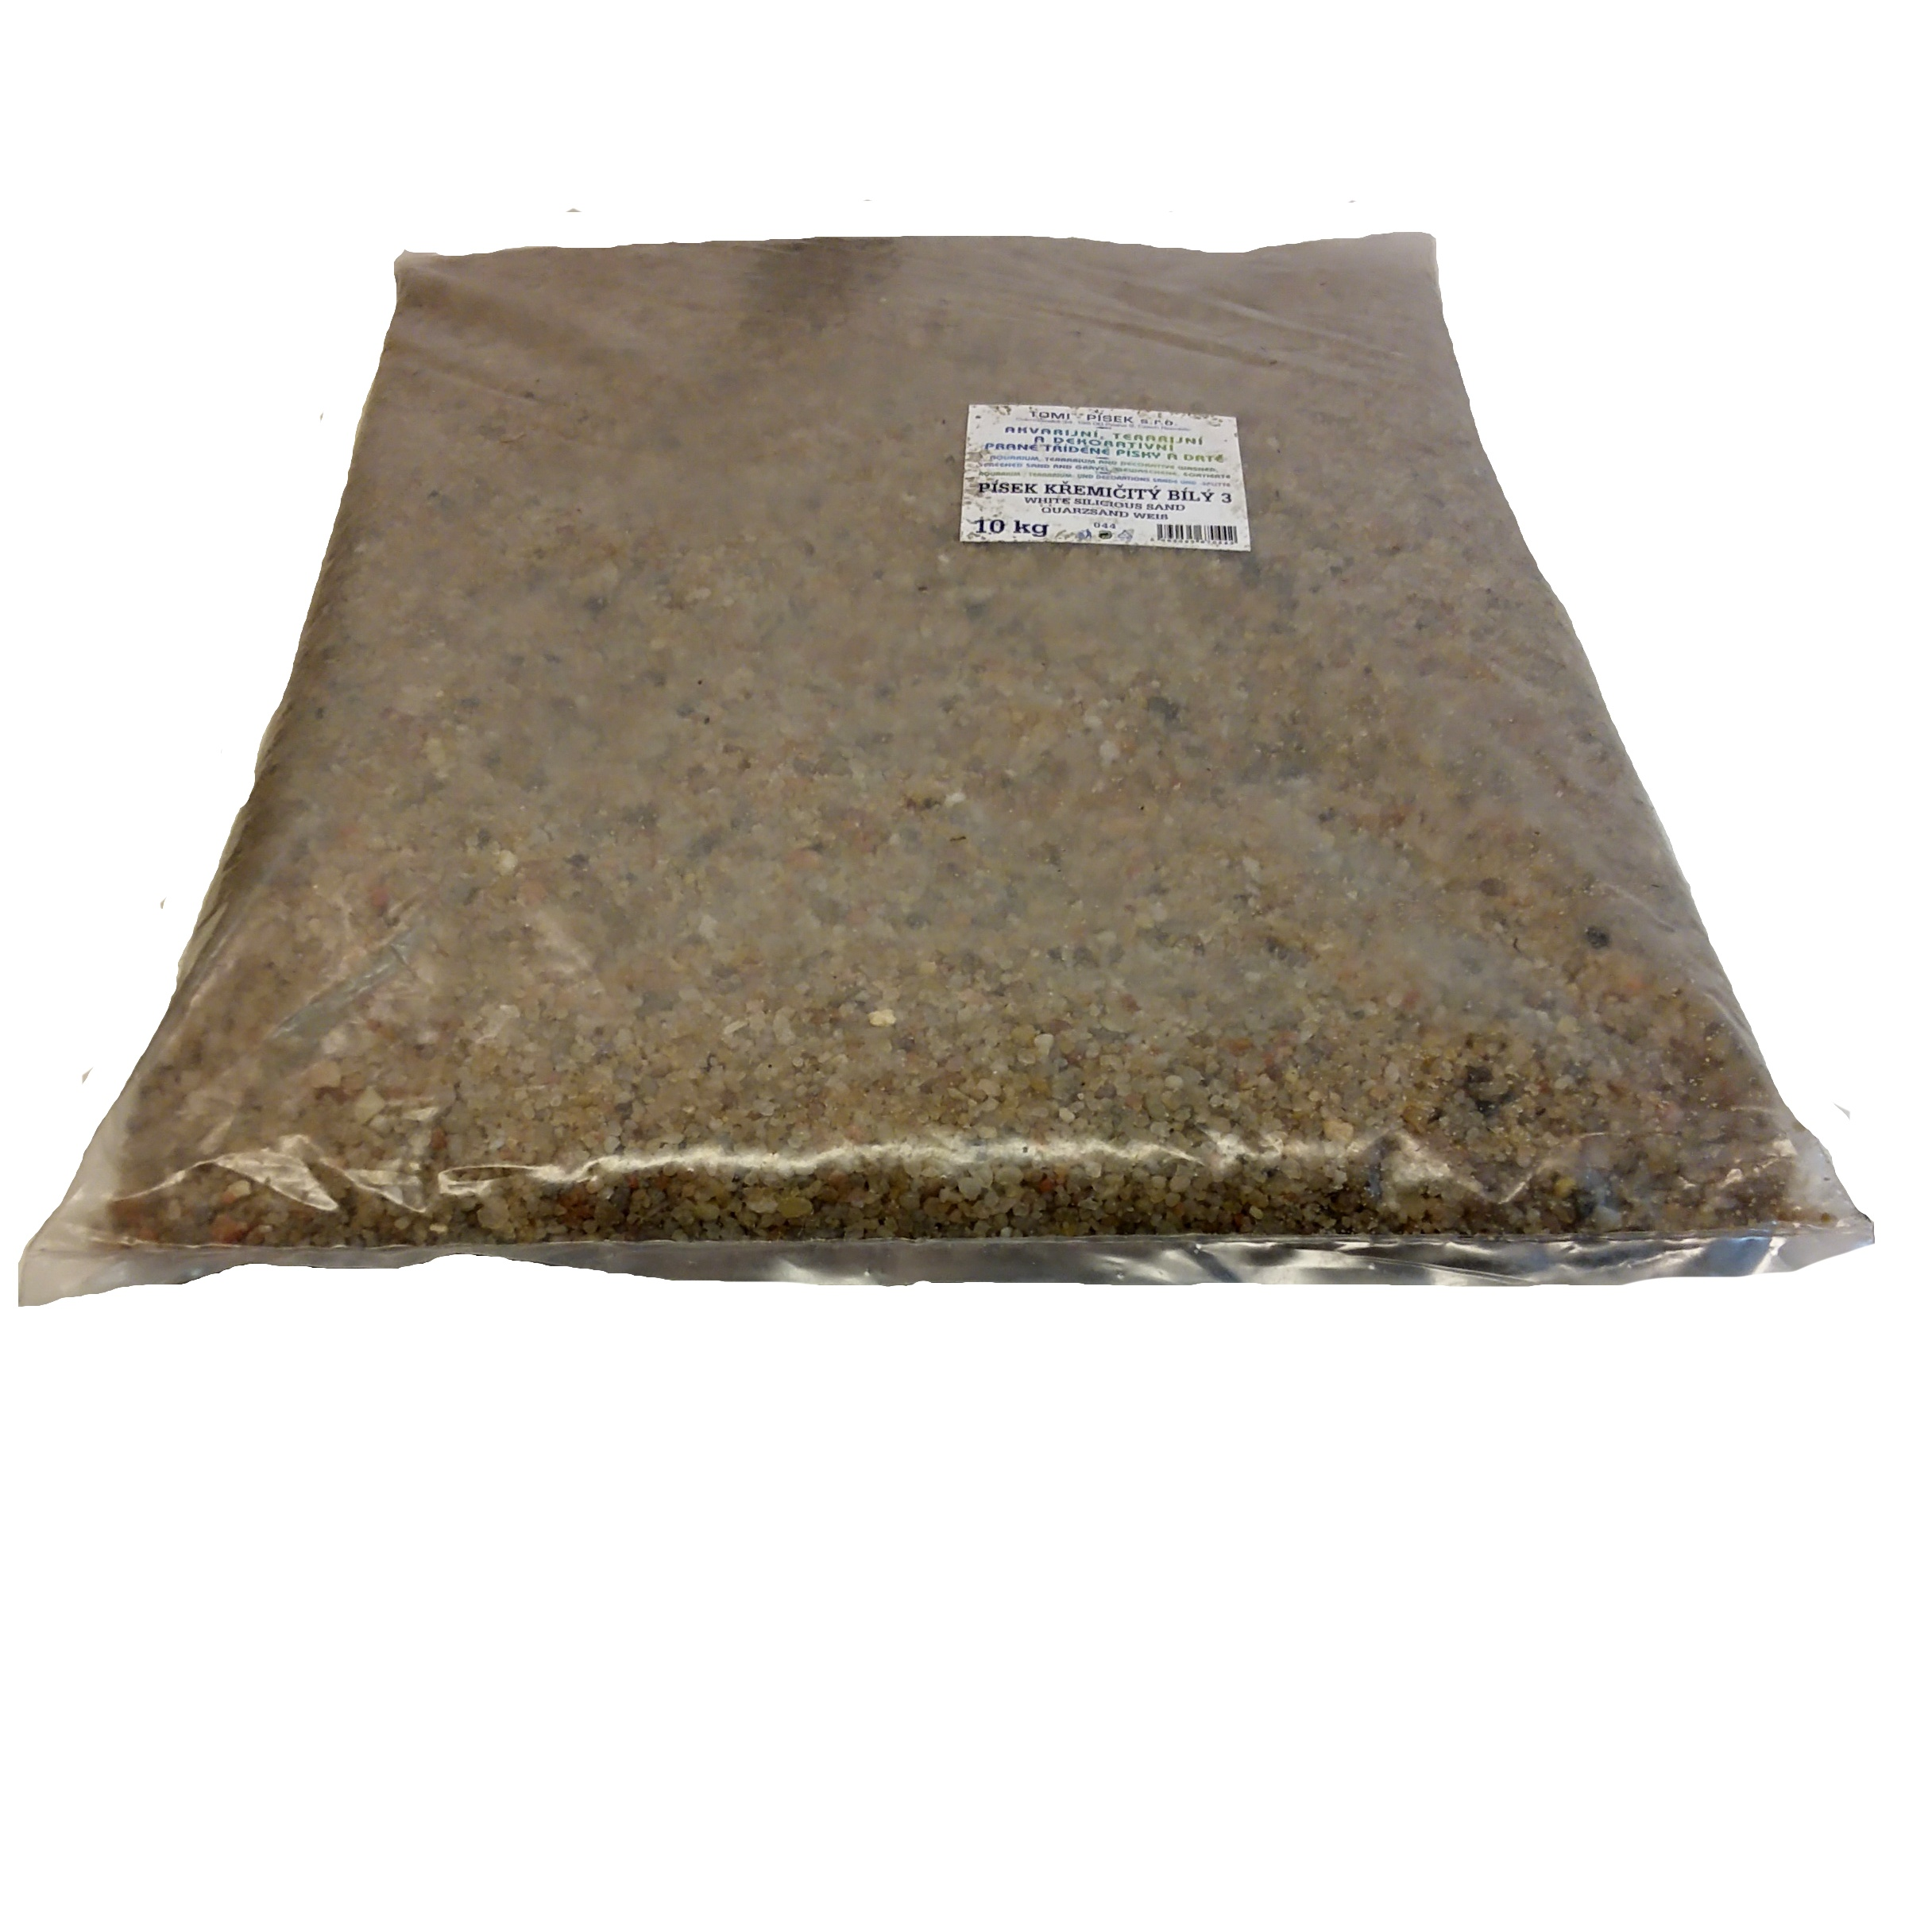 Písek křemičitý bílý To-pi č. 3 - 10 kg